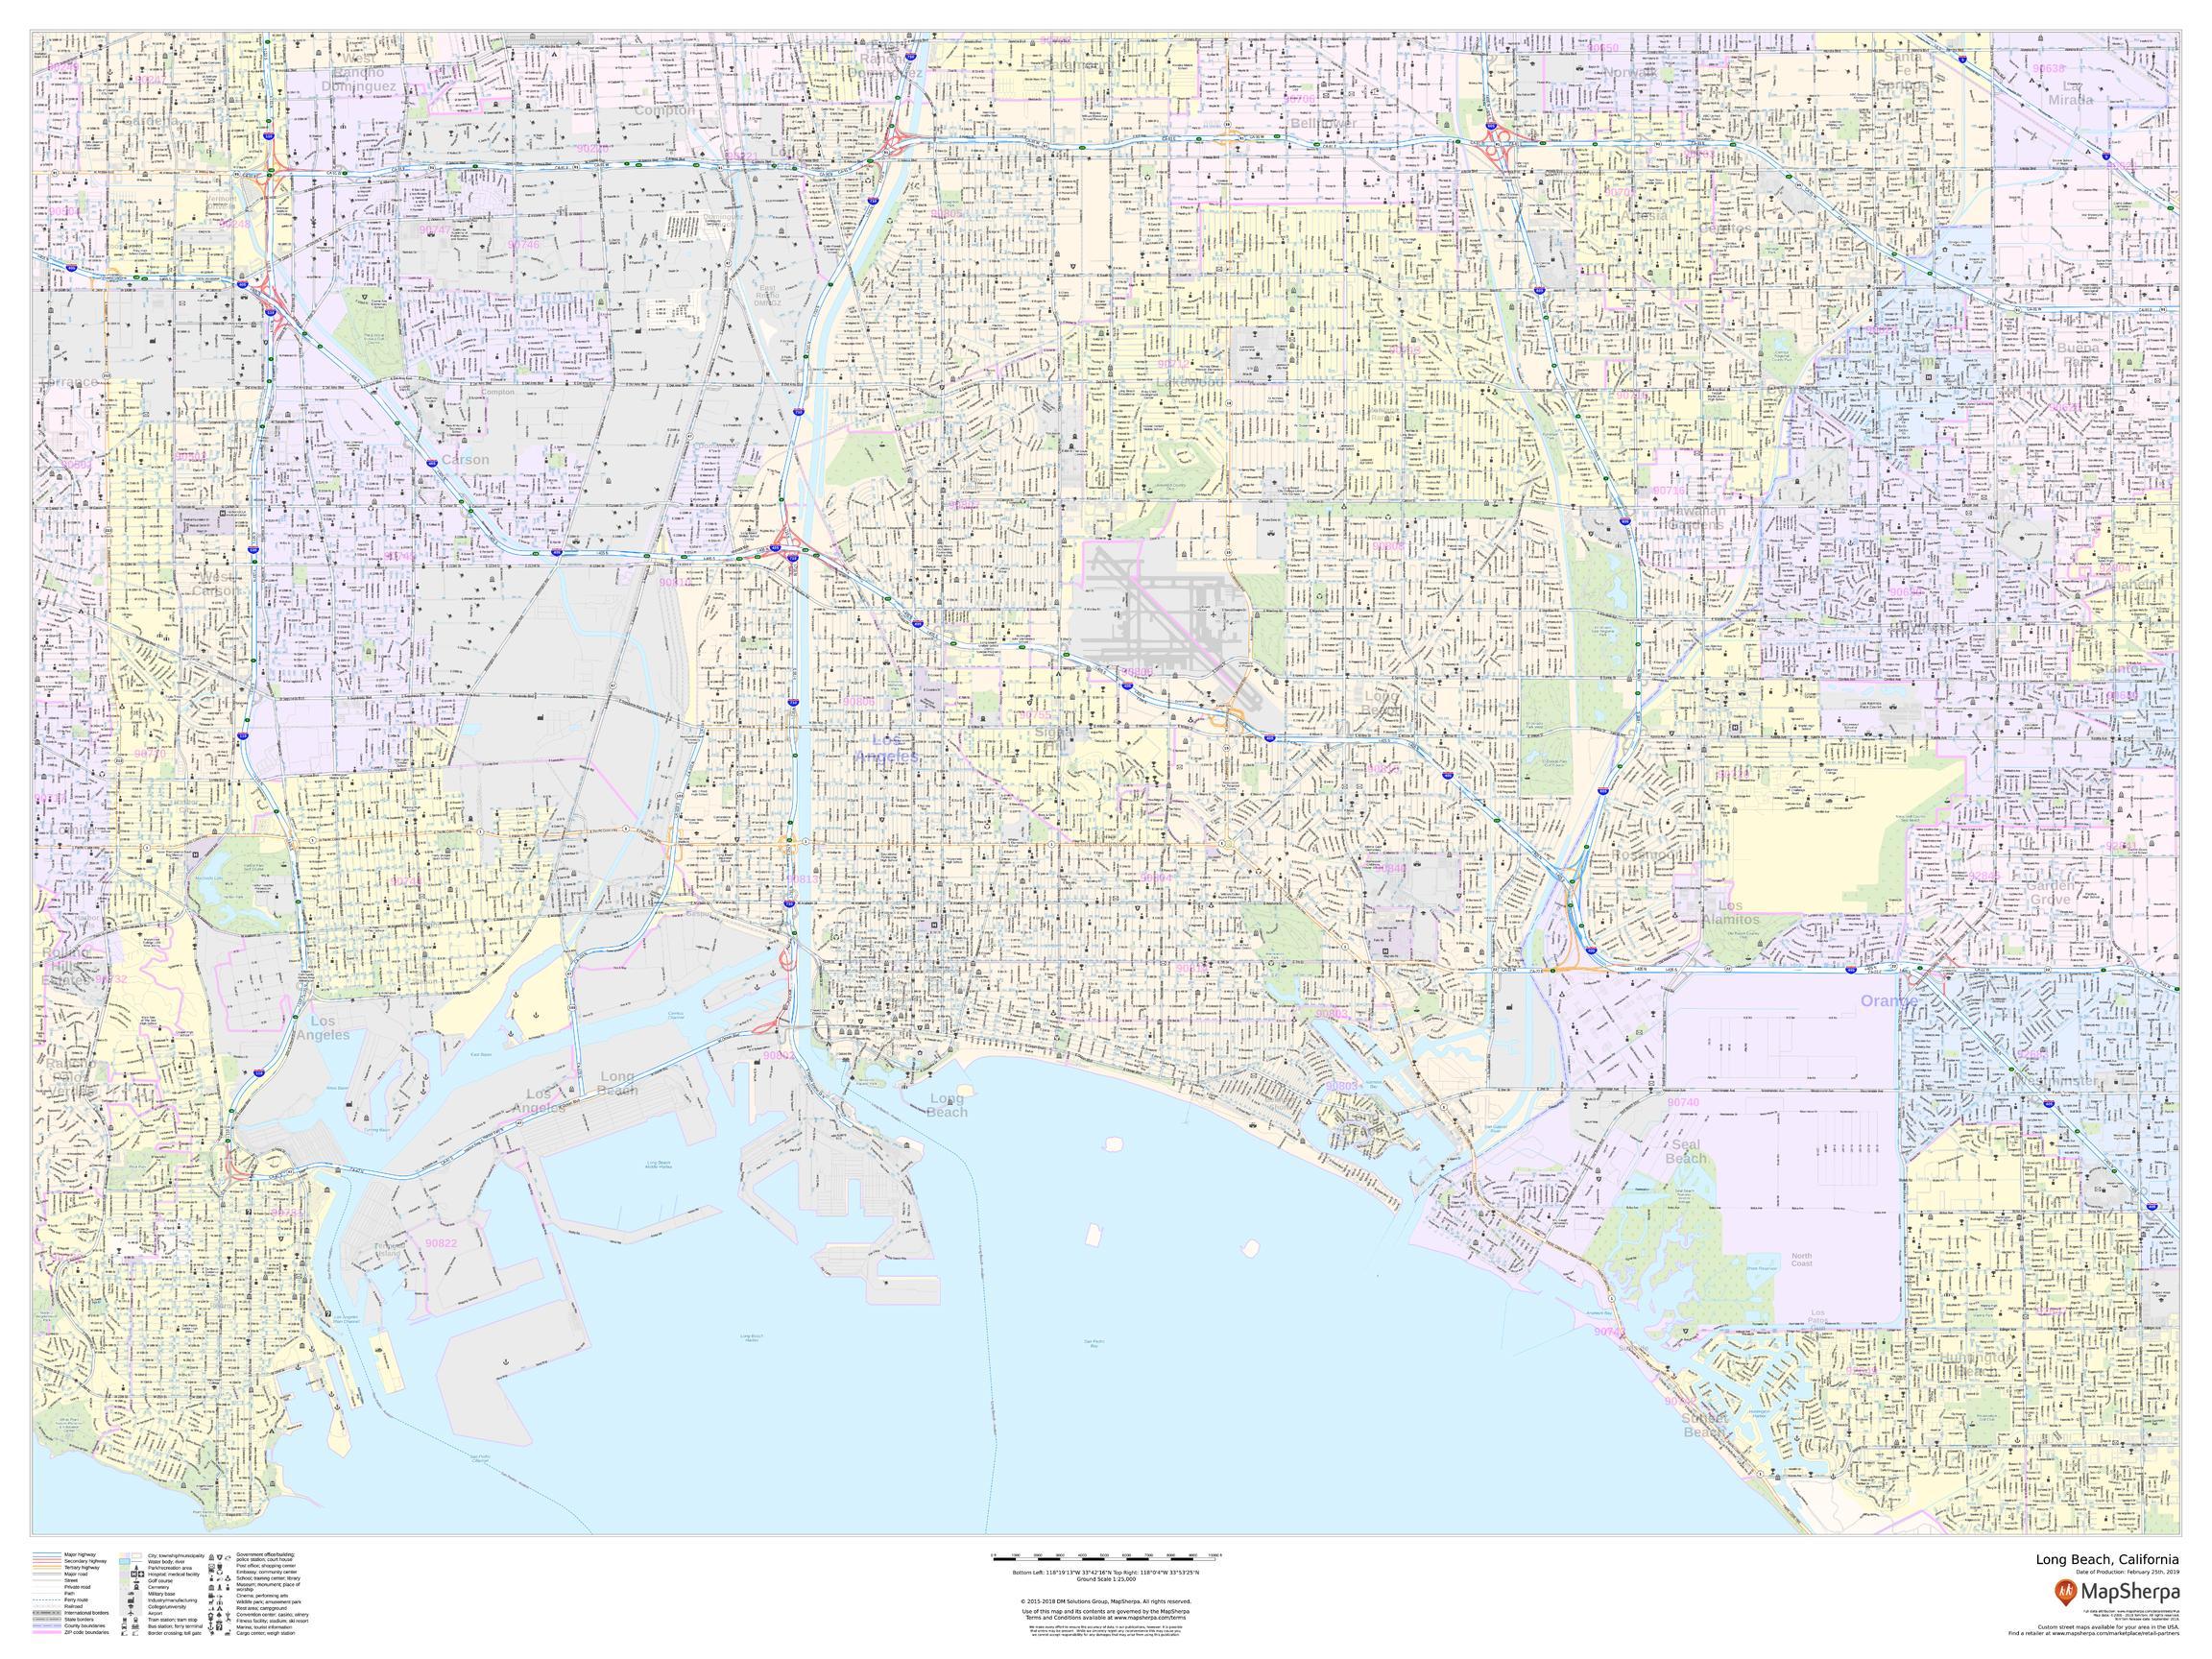 Long Beach, California - Landscape Map